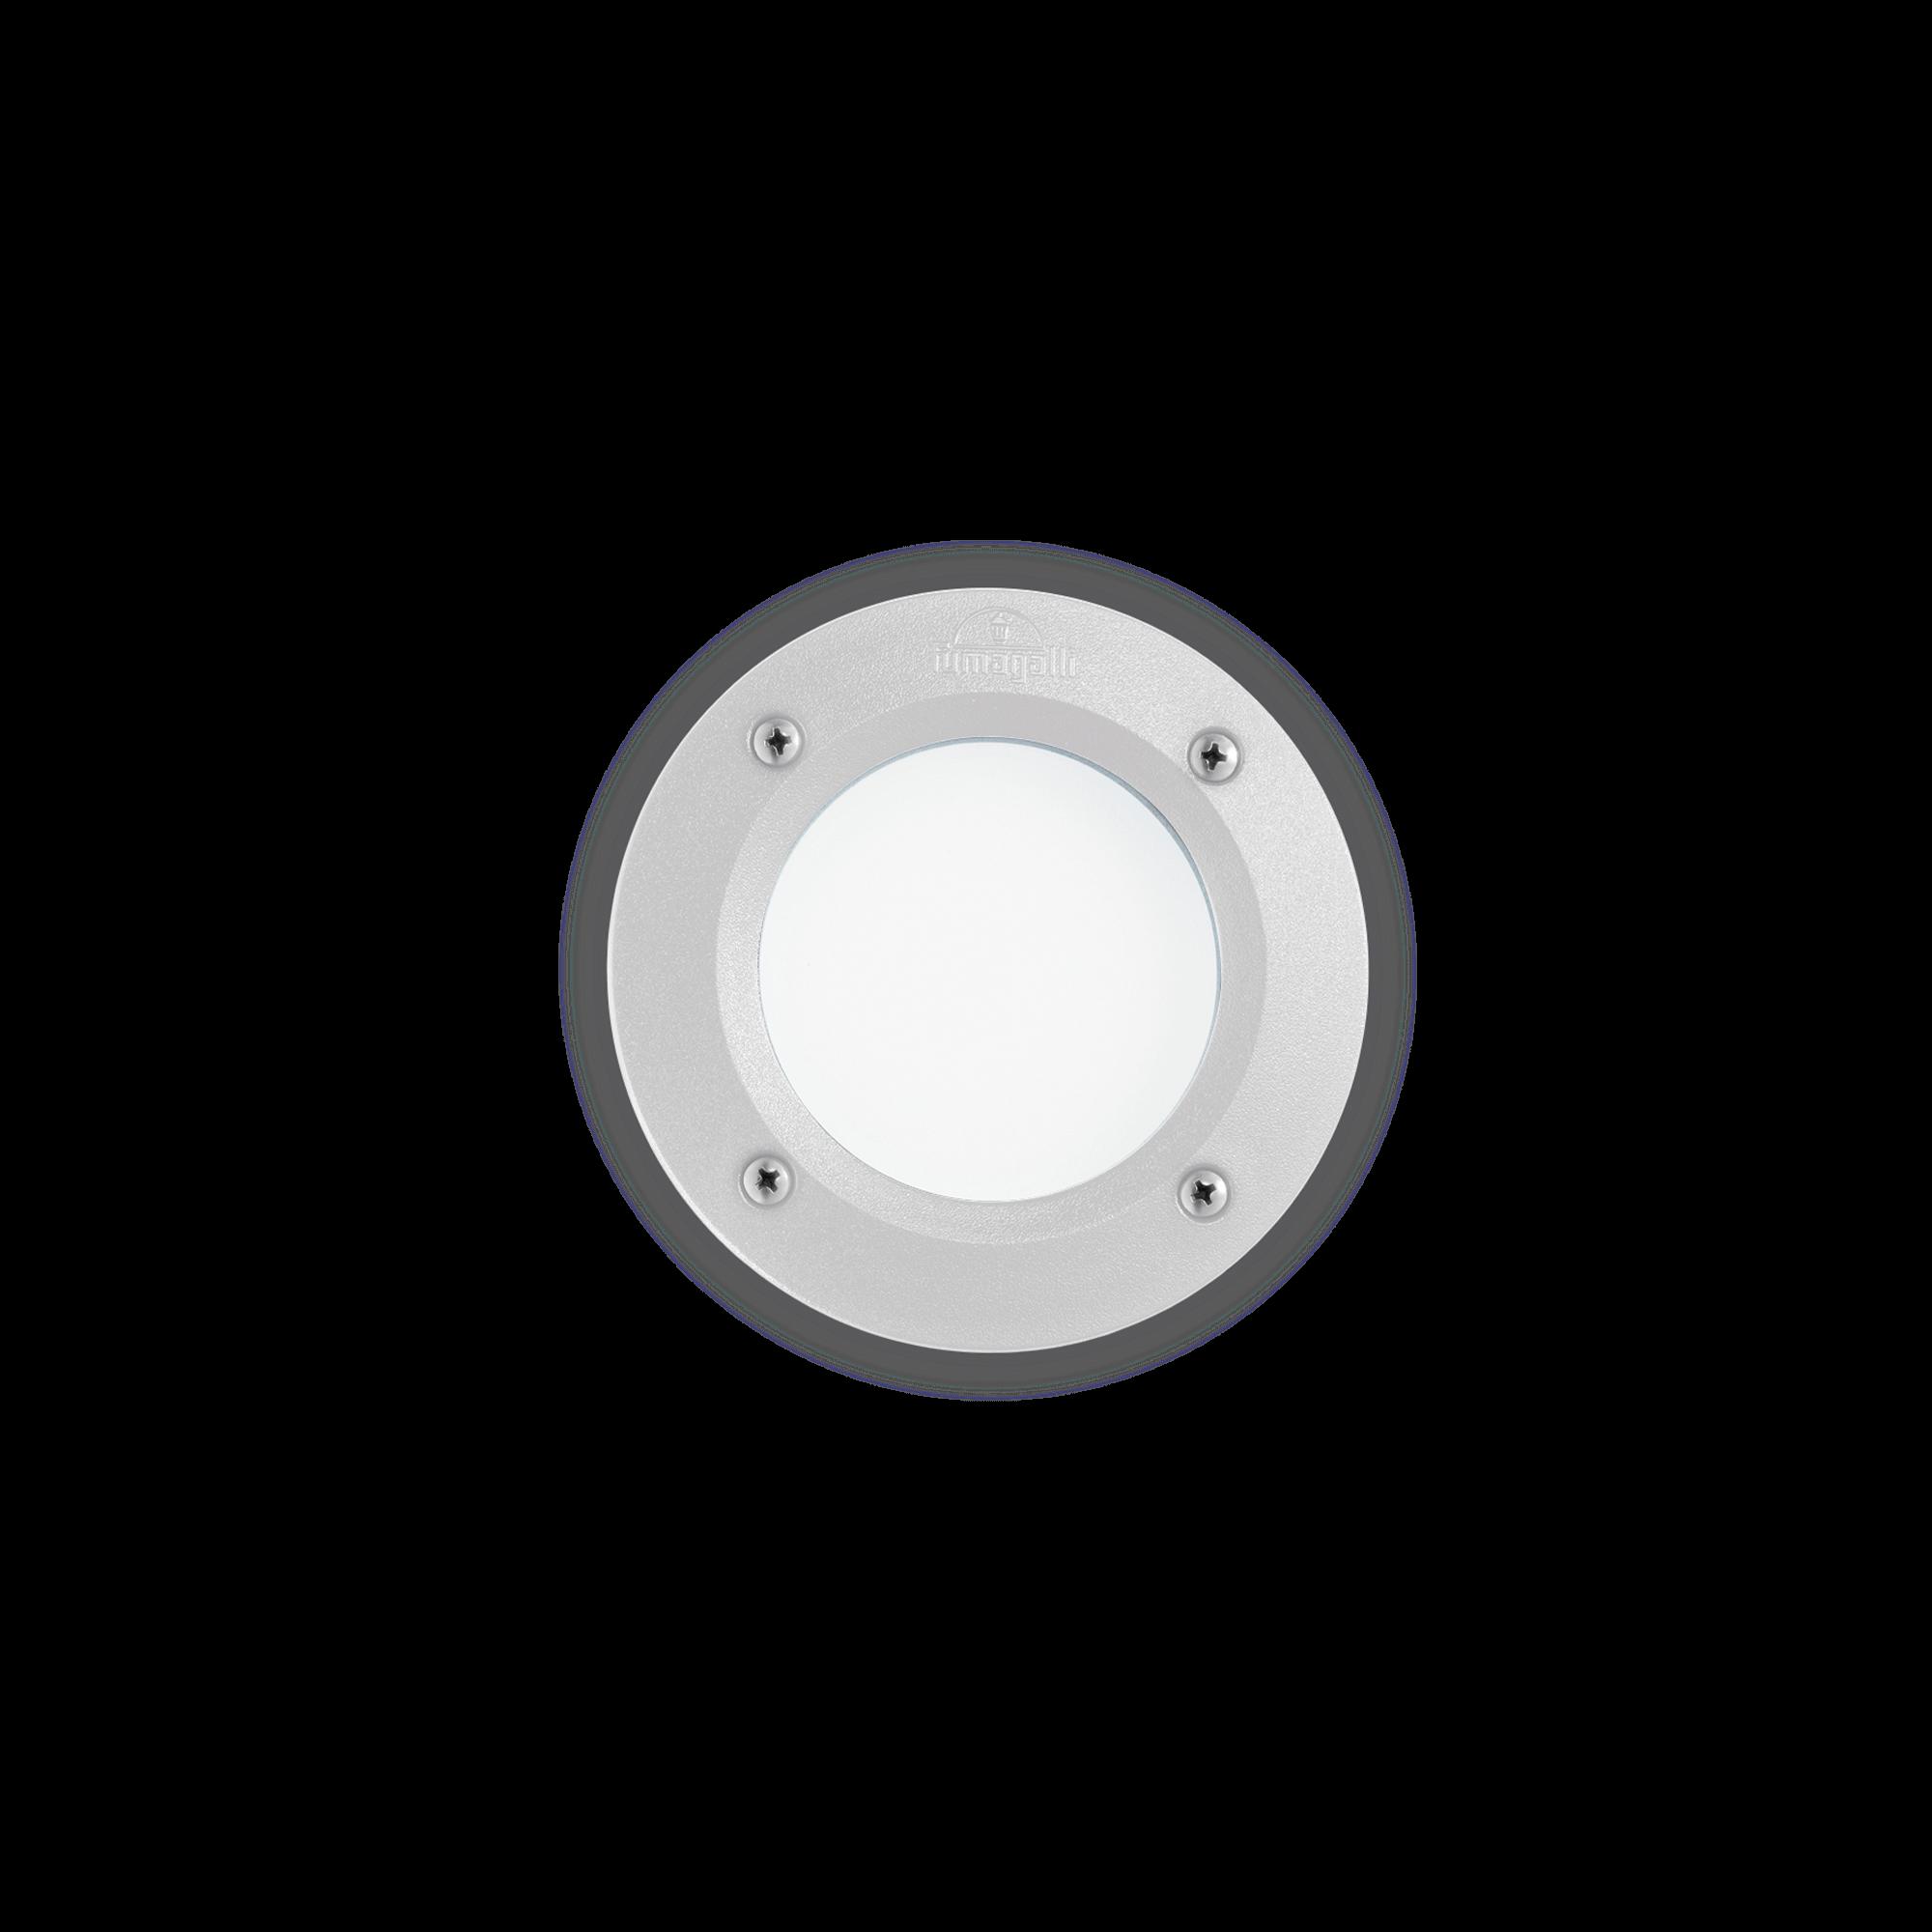 096544_WEB001_LETI_PT1_ROUND_BIANCO_zoom